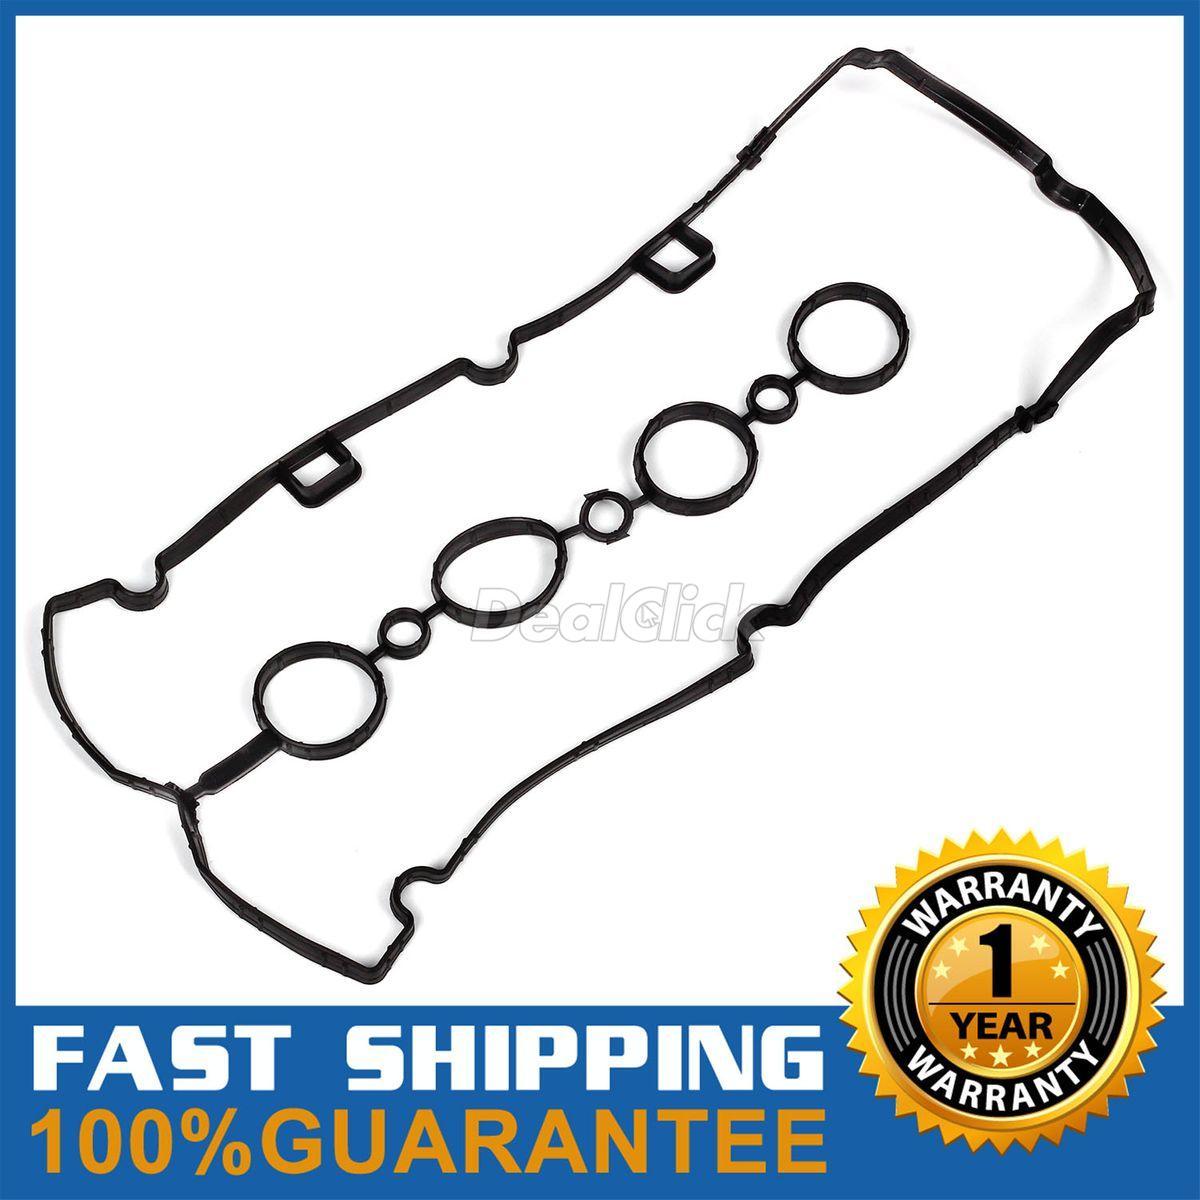 Car Engine Valve Cover Gasket 55354237 For Chevrolet Aveo Cruze Sonic G3 Astra